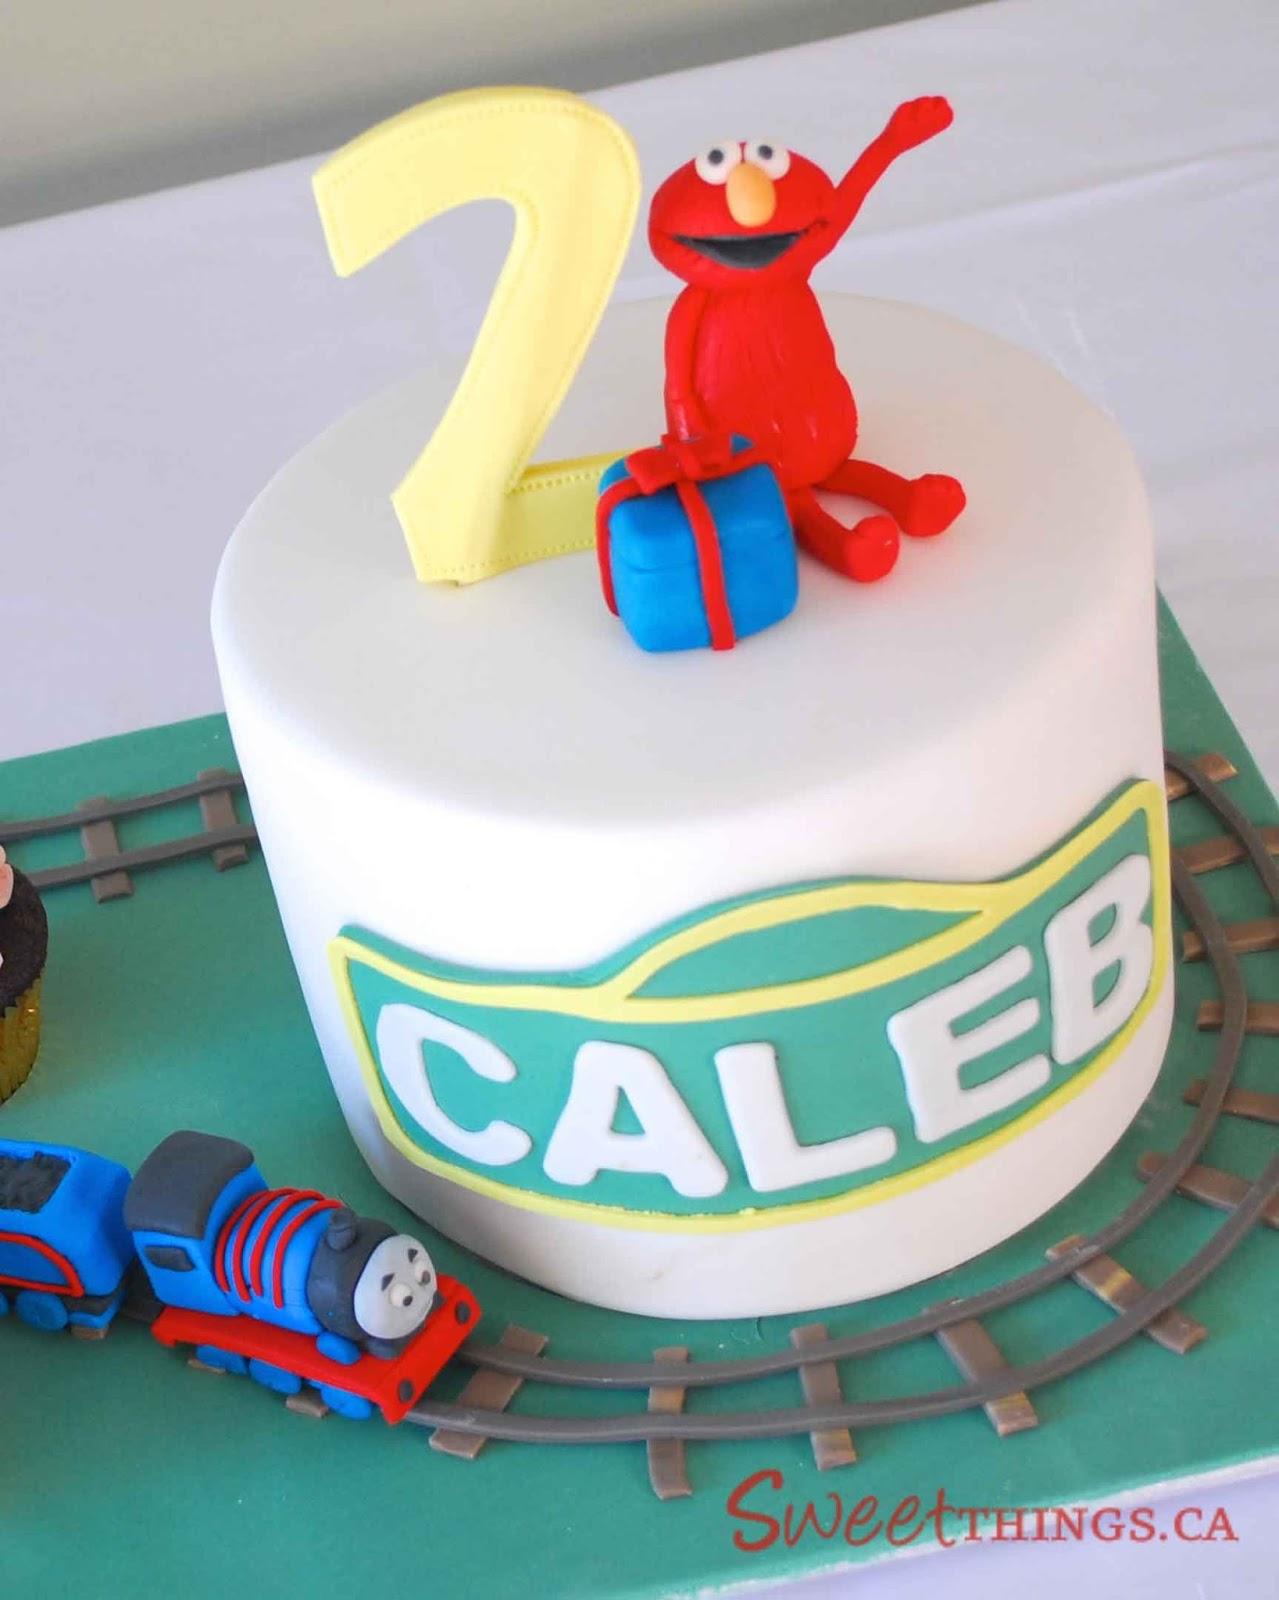 Sweetthings 2nd Birthday Cake